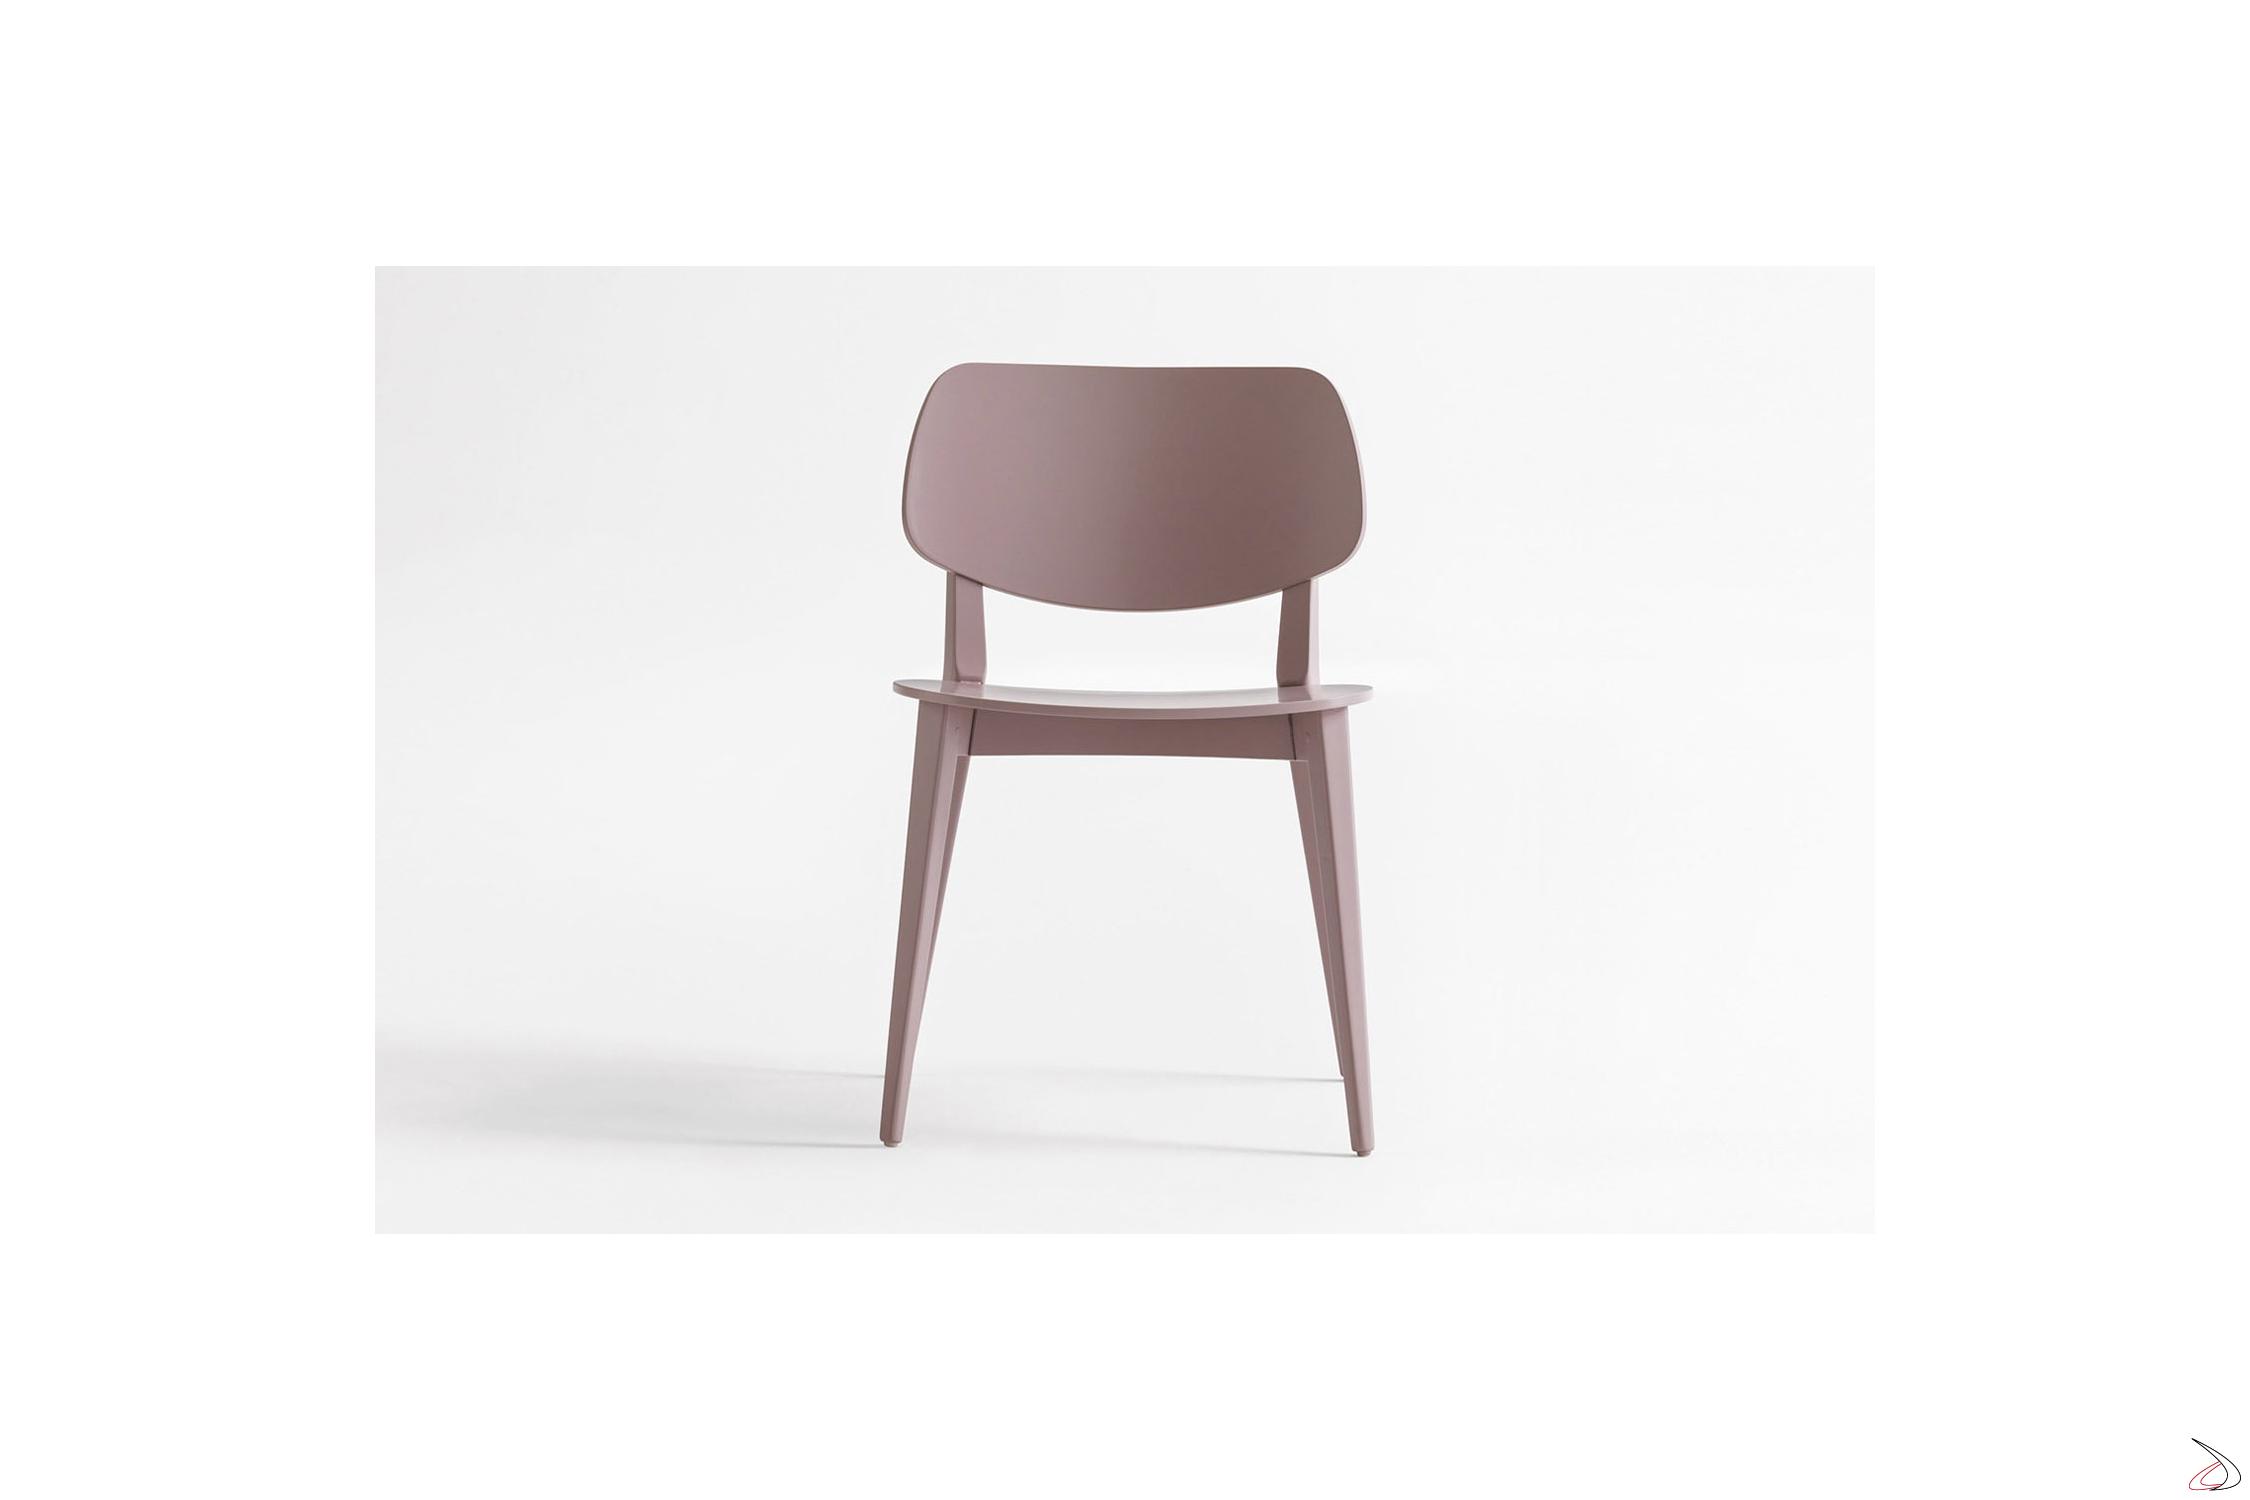 Sedie Cucina Legno Colorate.Doll Chair